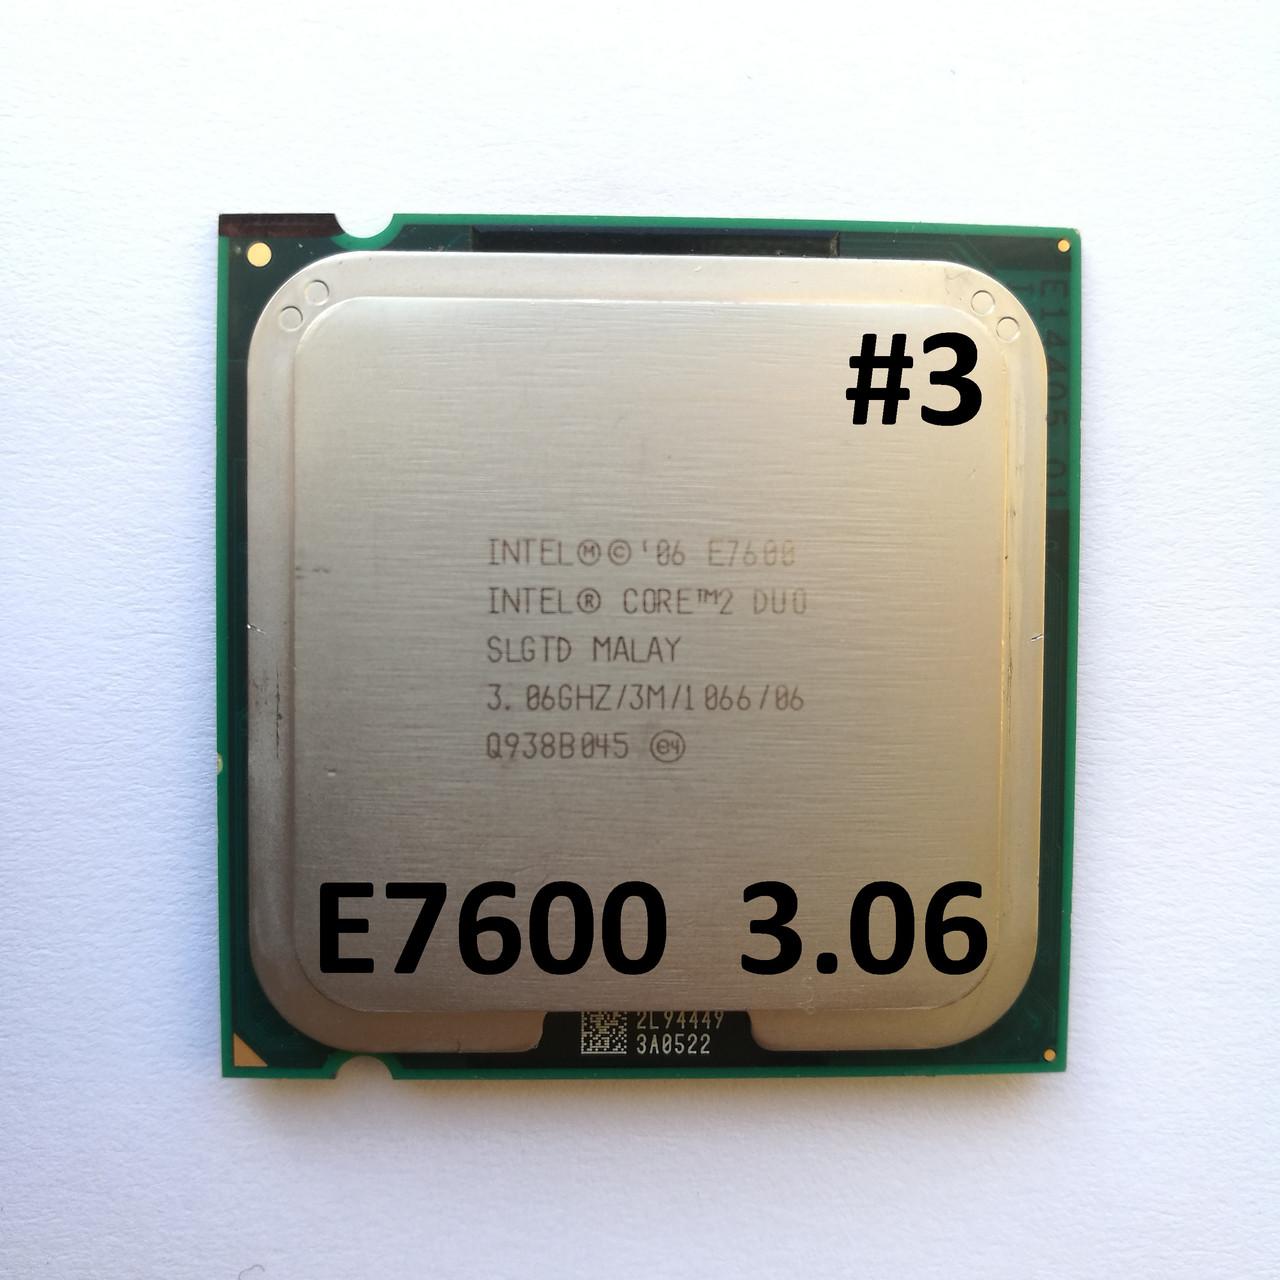 Процессор ЛОТ#3 Intel® Core™2 Duo E7600 R0 SLGTD 3.06GHz 3M Cache 1066 MHz FSB Socket 775 Б/У